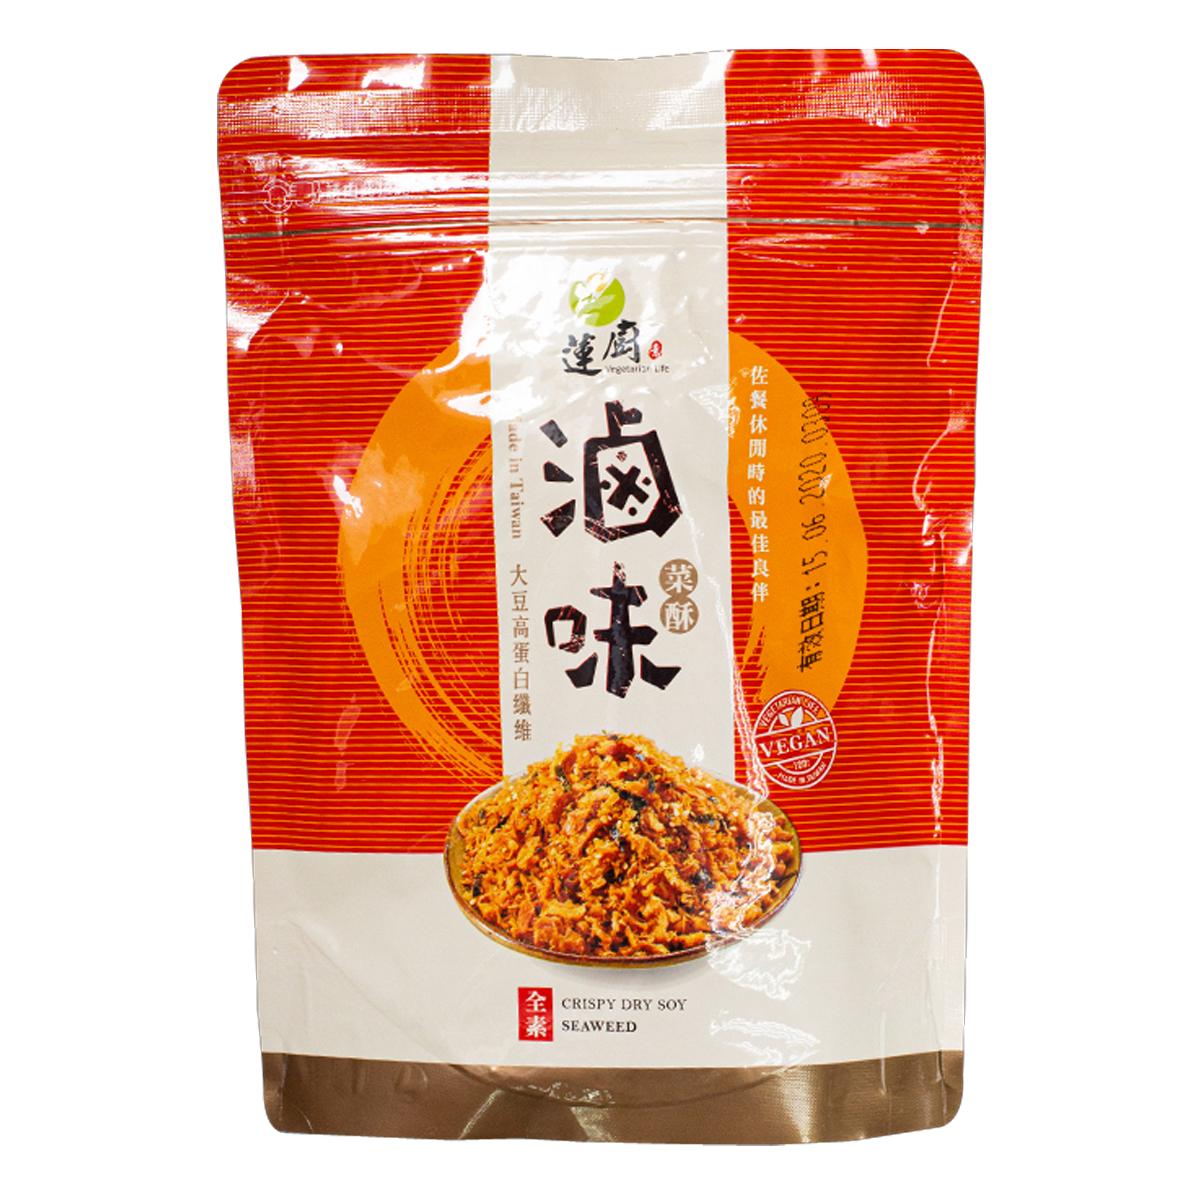 Image High Protein Soya Meat Floss 莲厨-卤味菜酥 肉松 300grams